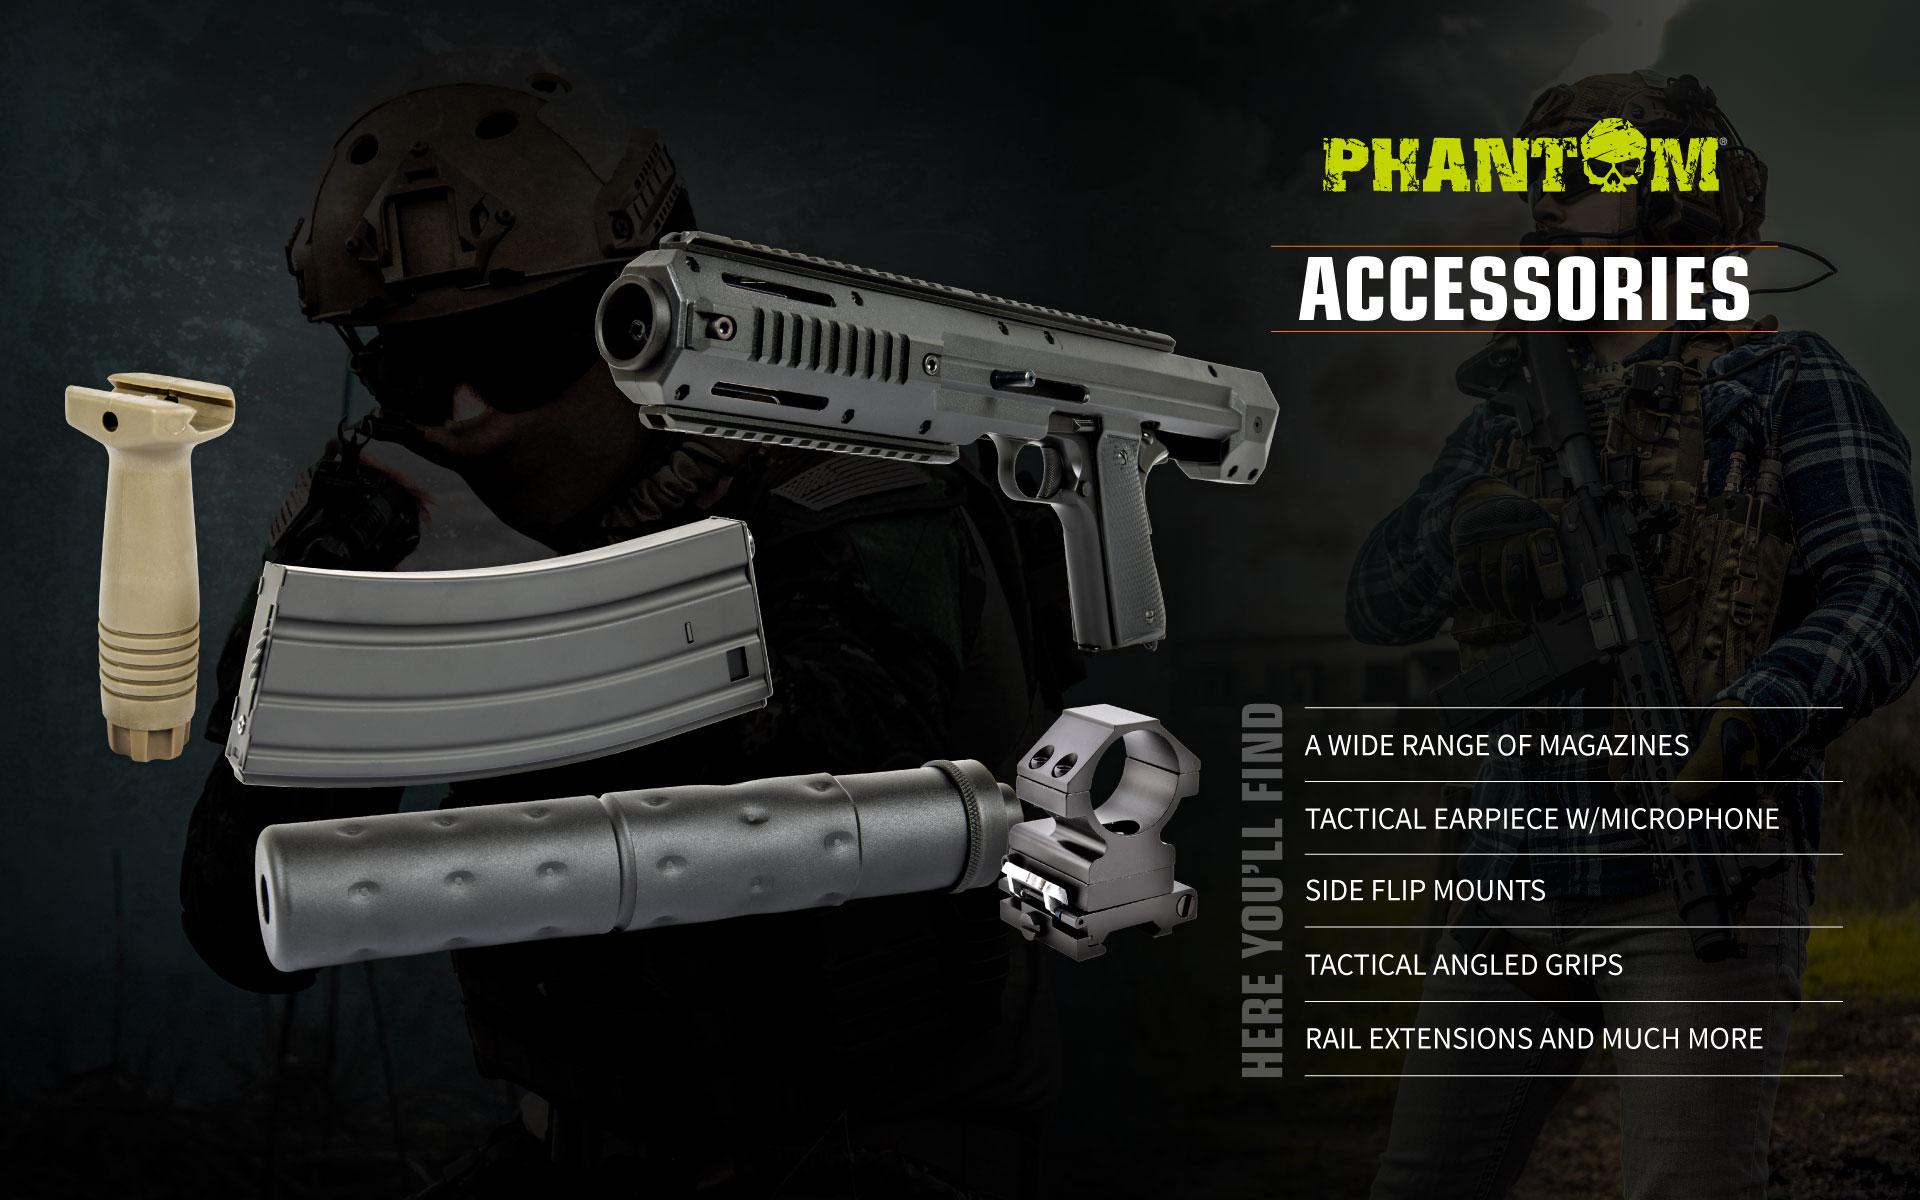 Phantom Accessories